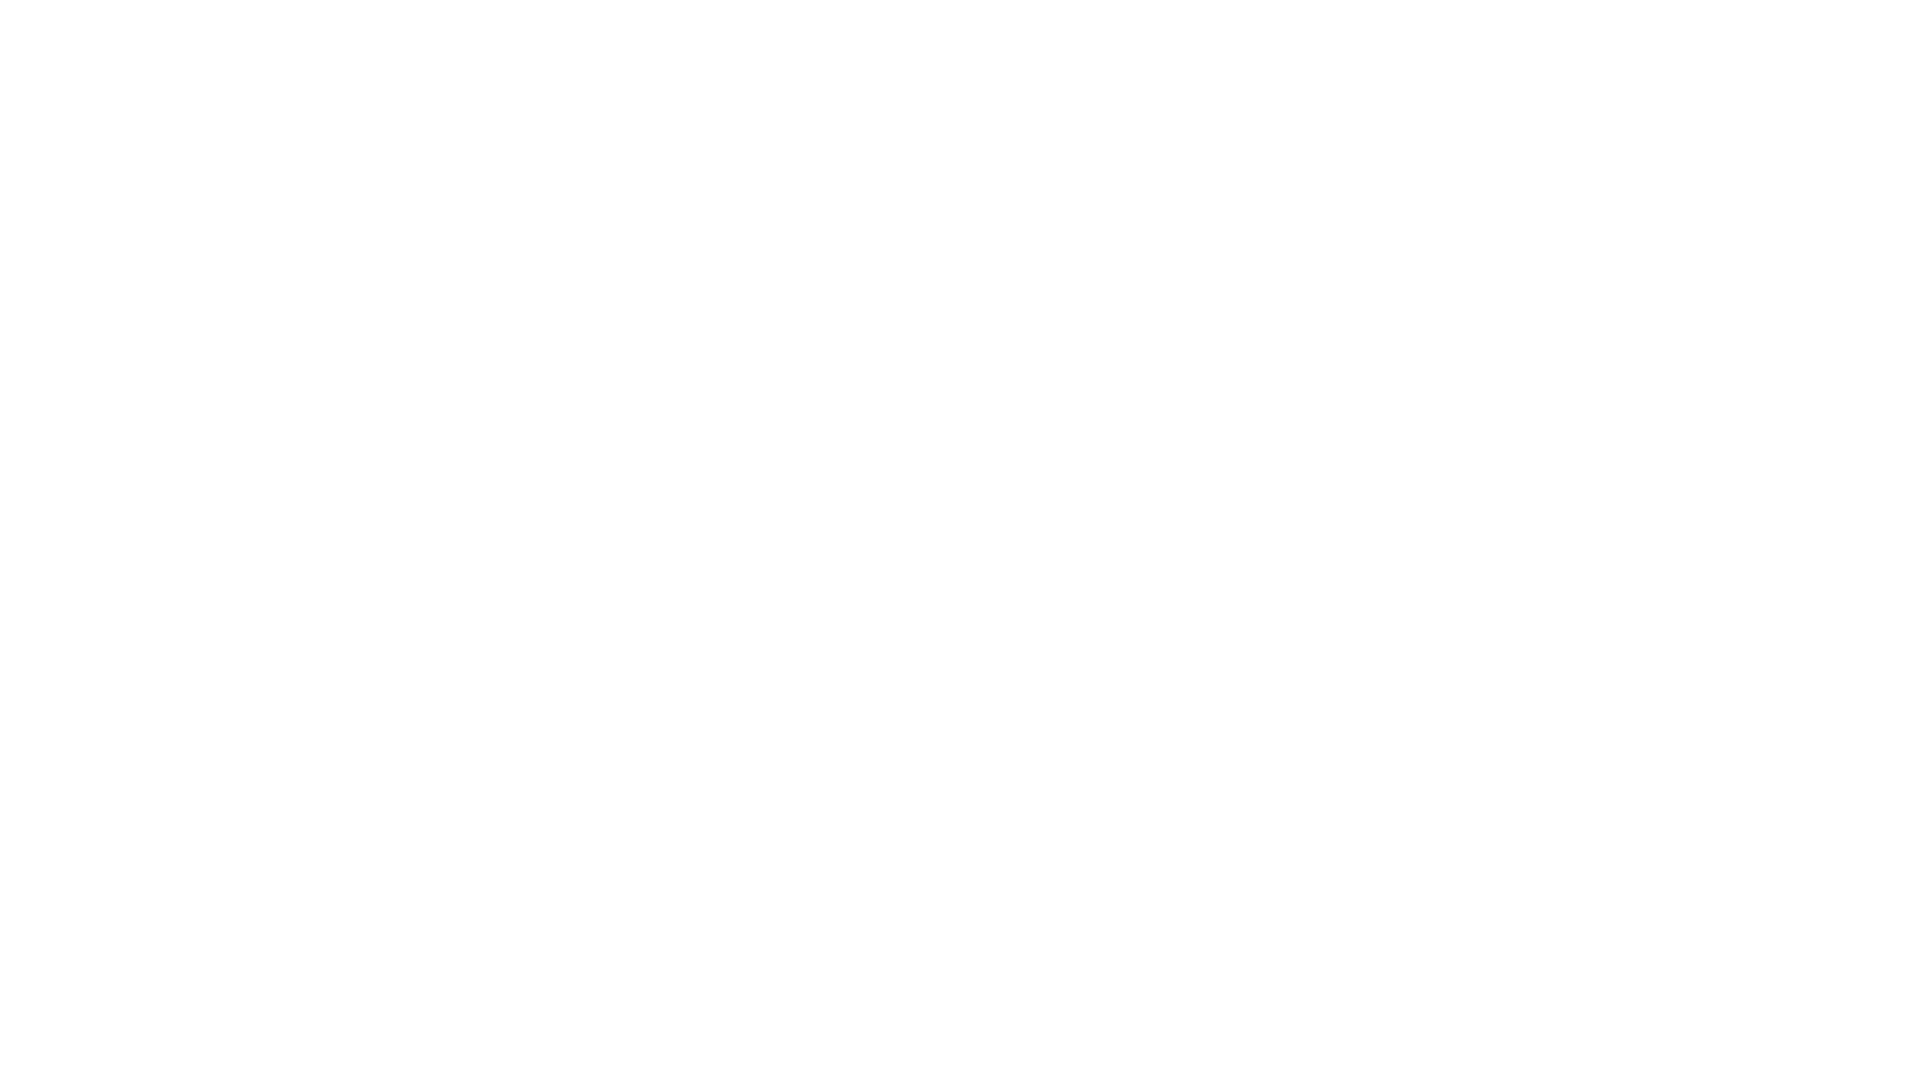 transparent background